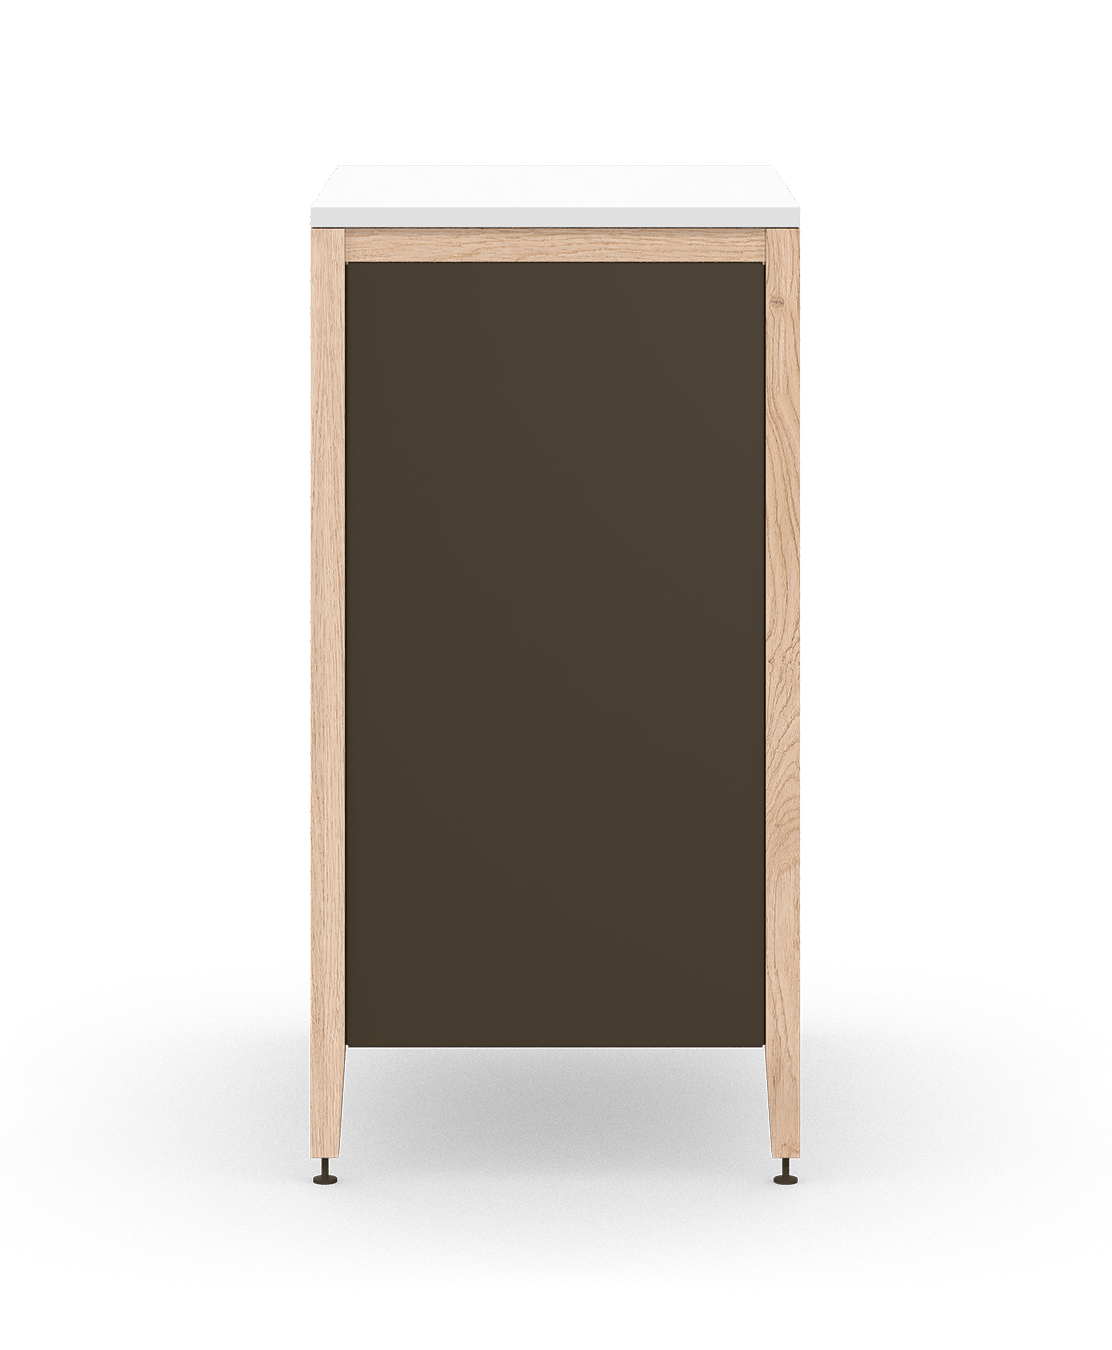 coquo radix white oak solid wood modular 2 shelves 1 drawer base kitchen cabinet 21 inch C1-C-21TB-1021-NA